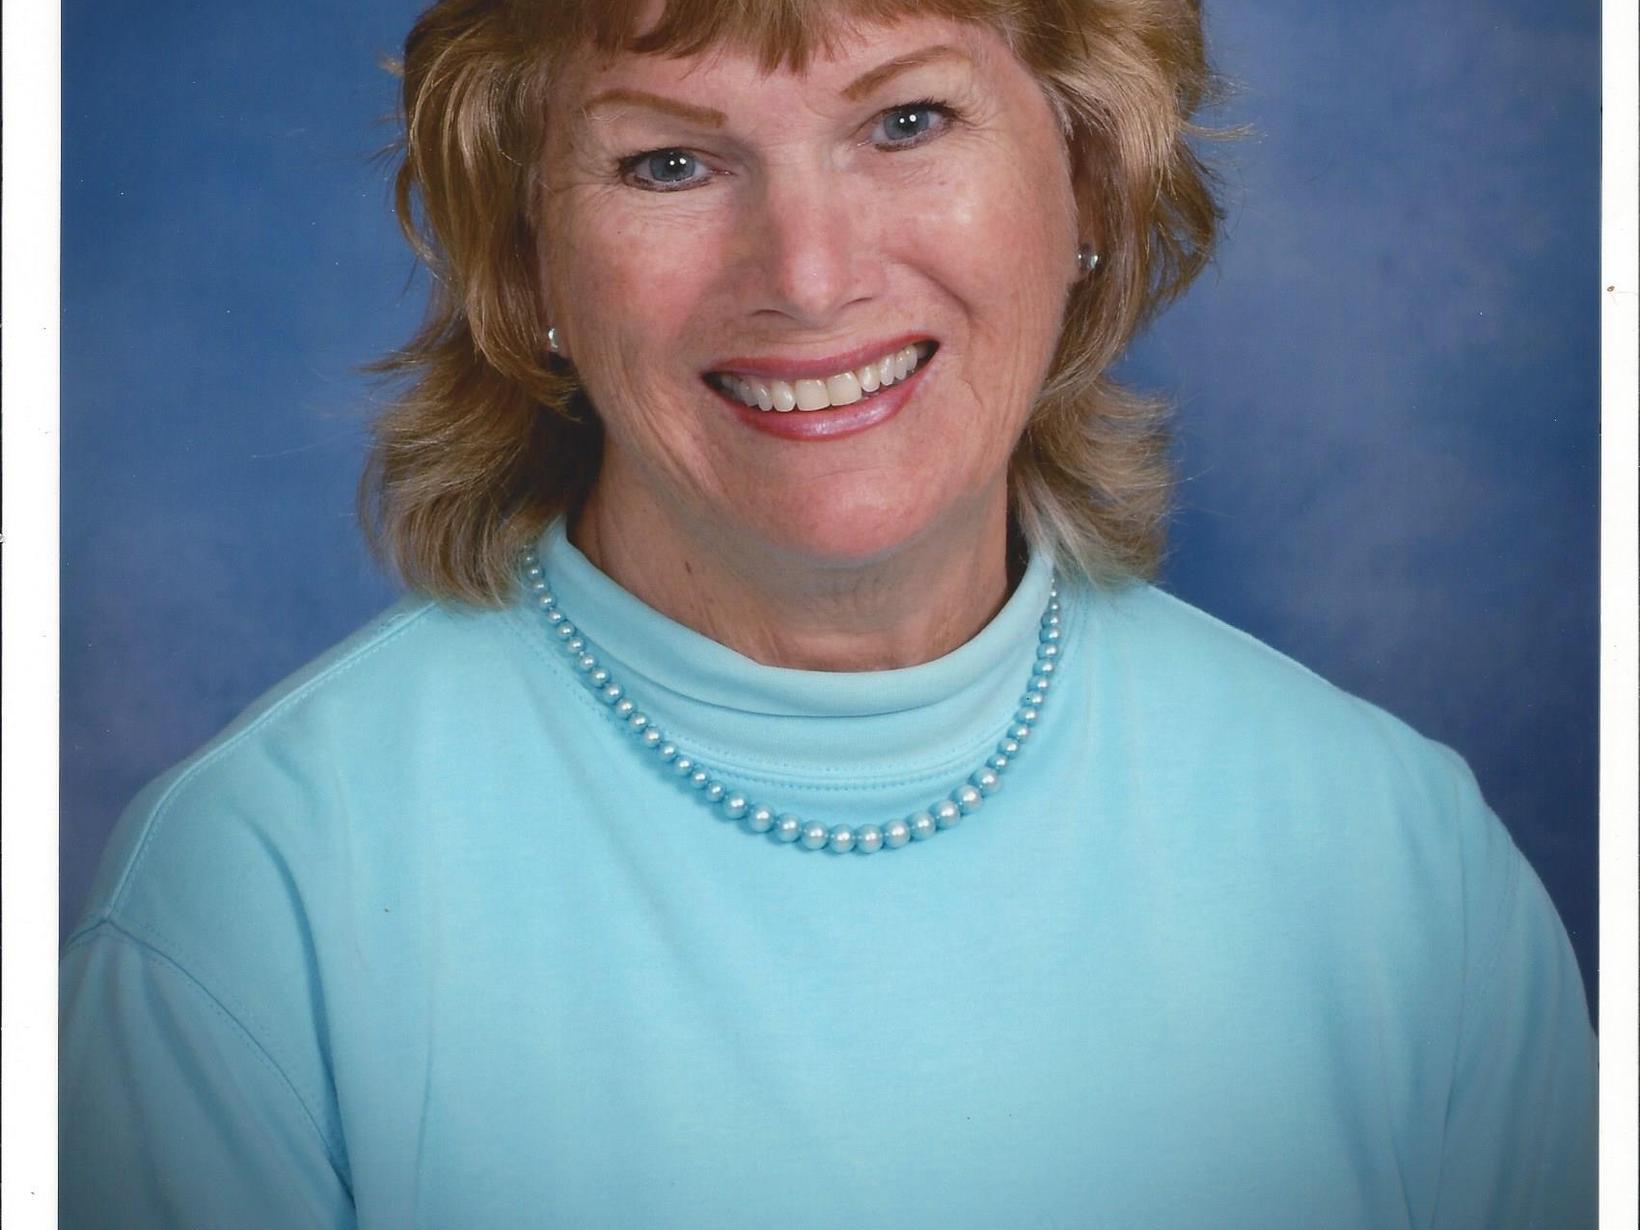 Kathy from Bradenton, Florida, United States